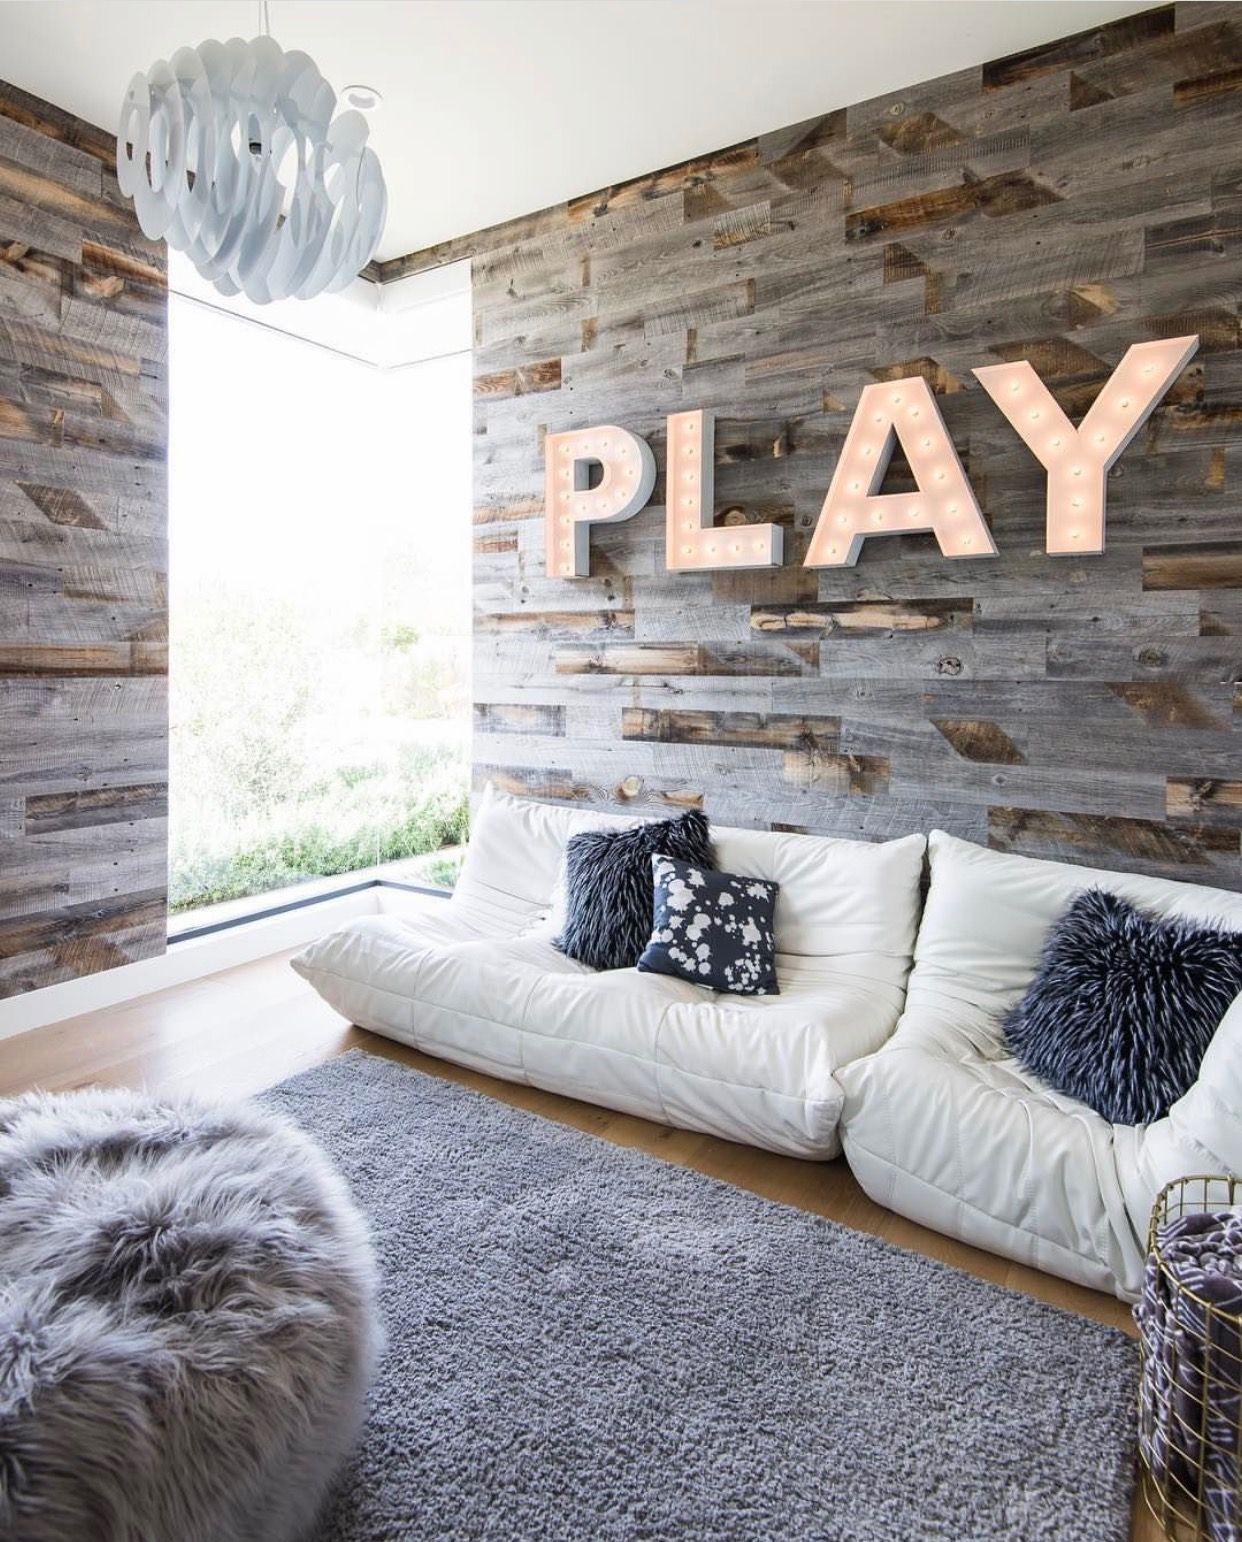 Via instagram stikwooddesign interior designrooms pinterest